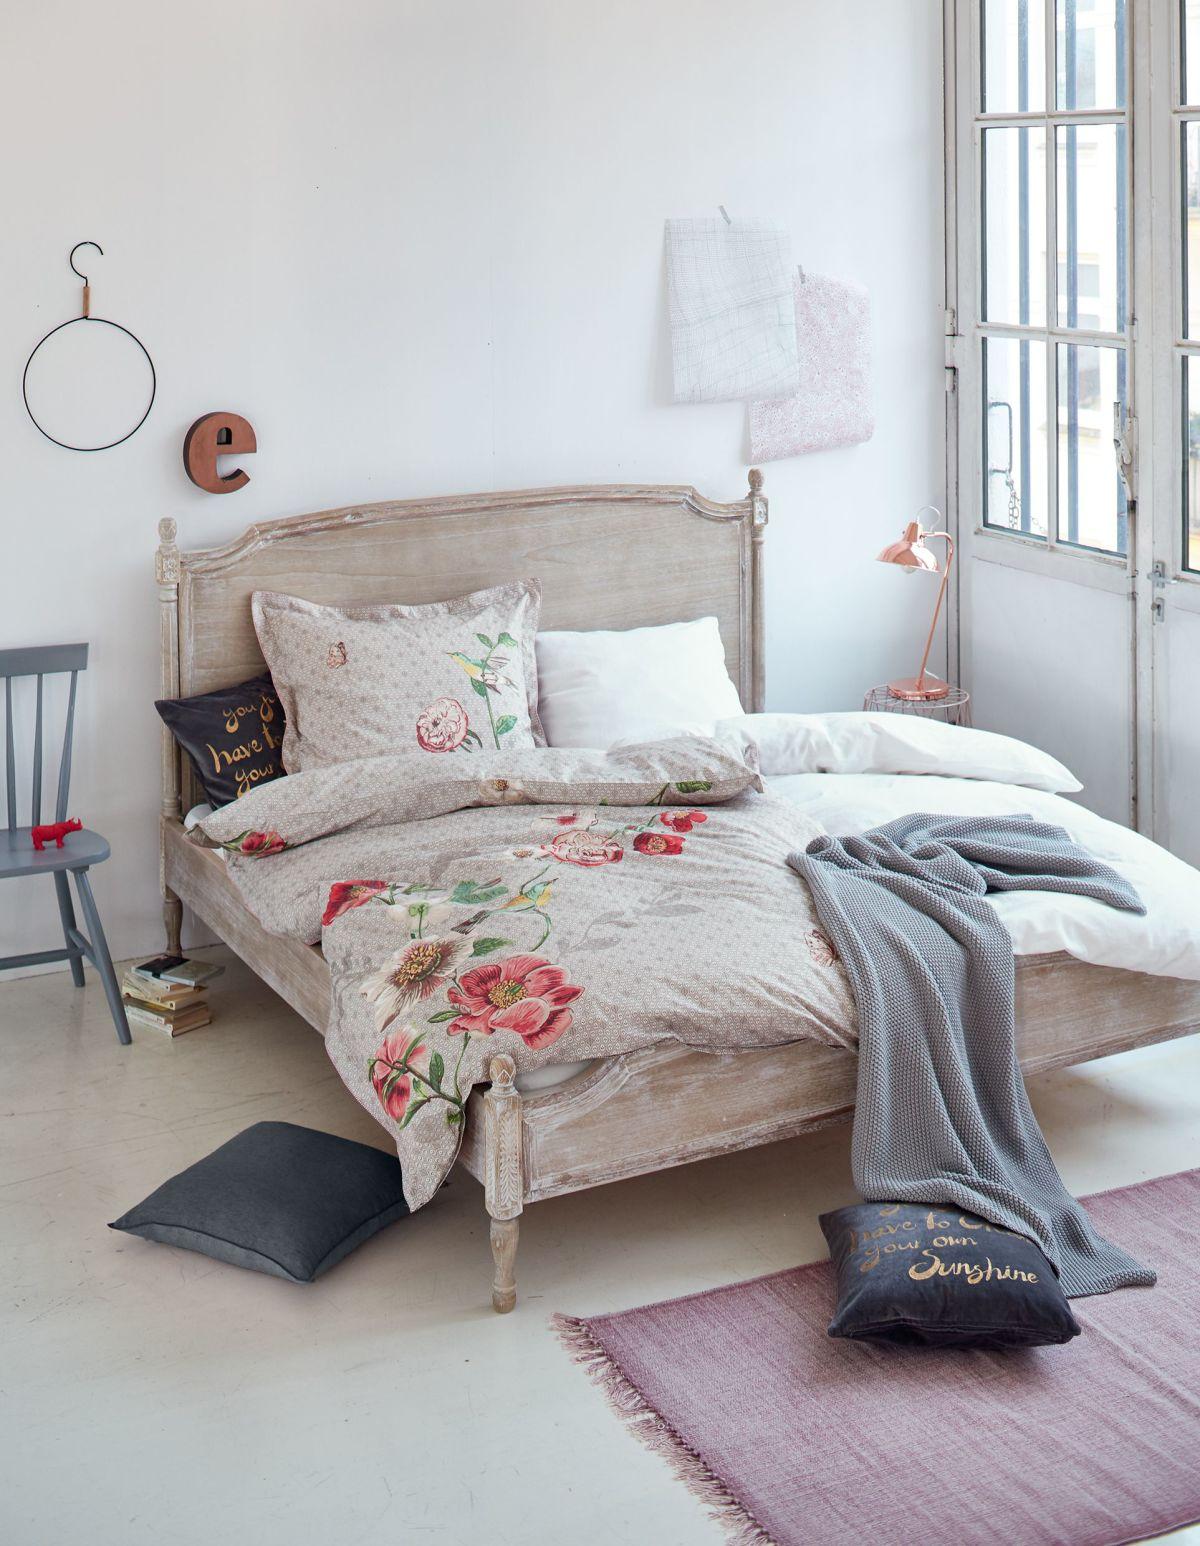 bett shabby chic shabby chic bett weiss betten house und dekor galerie bett shabby chic. Black Bedroom Furniture Sets. Home Design Ideas